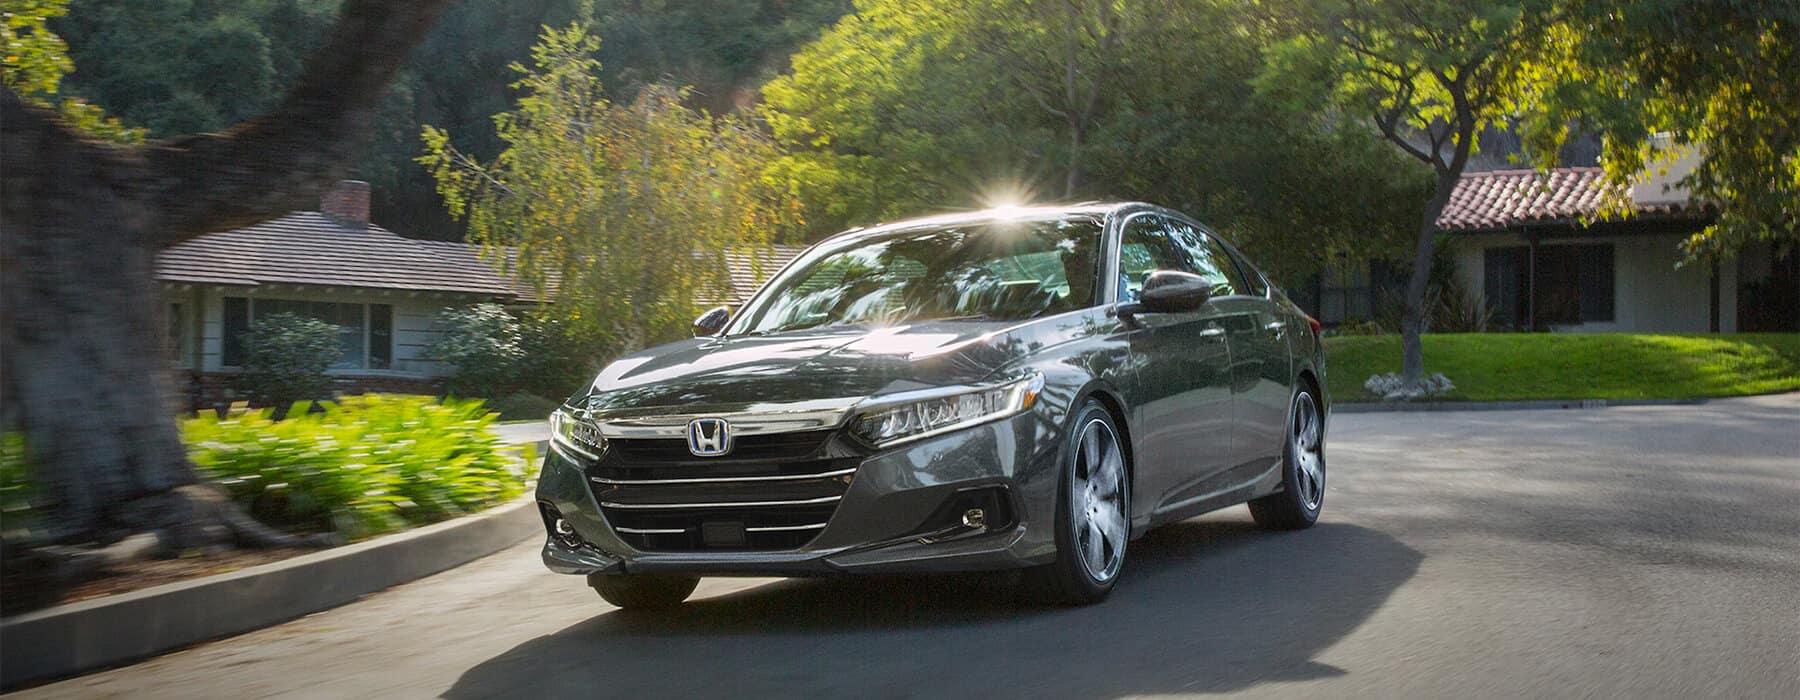 Redesigned 2021 Honda Accord Slider